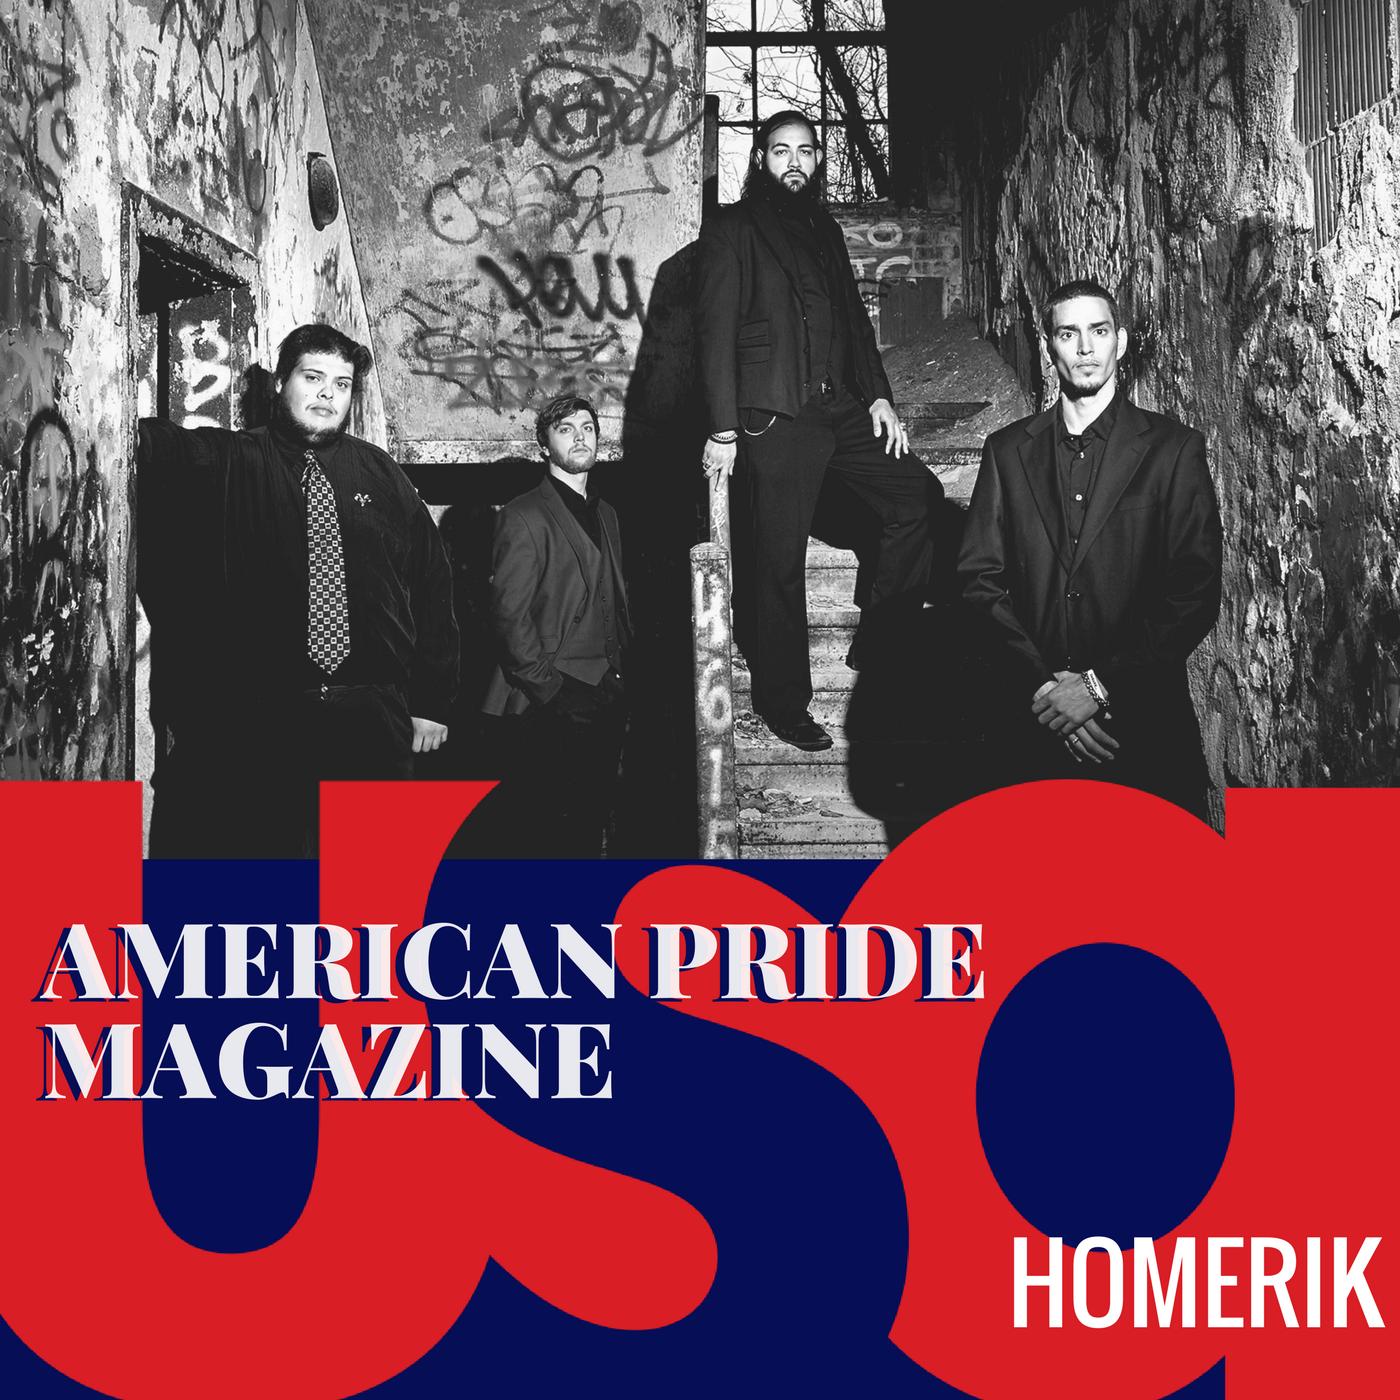 Homerik What Inspires Their Music